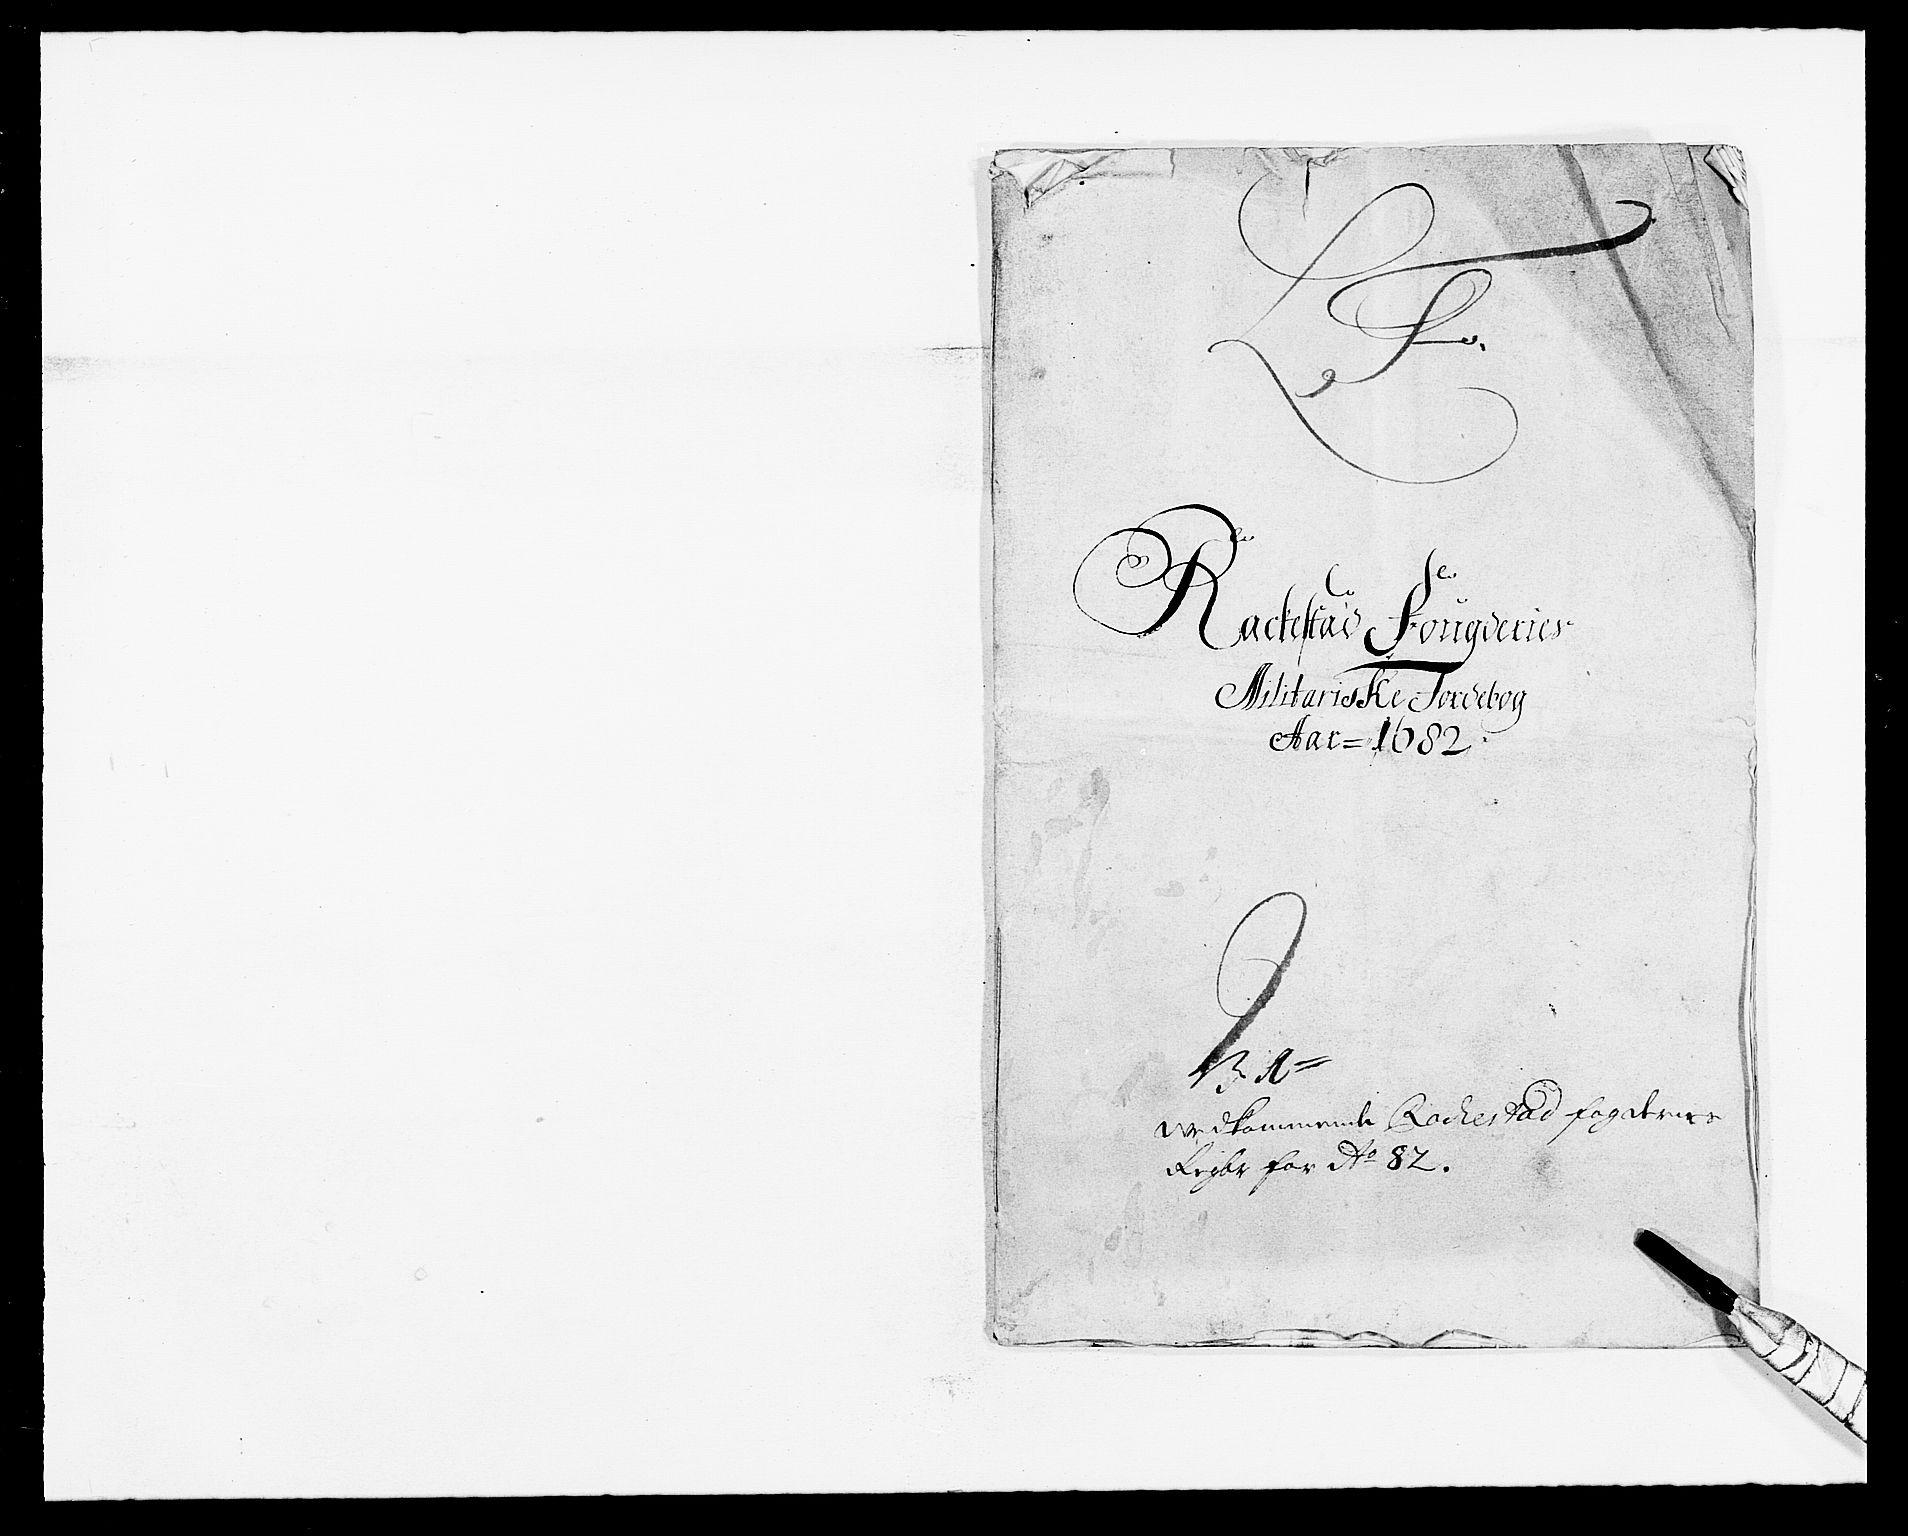 RA, Rentekammeret inntil 1814, Reviderte regnskaper, Fogderegnskap, R05/L0273: Fogderegnskap Rakkestad, 1682, s. 152